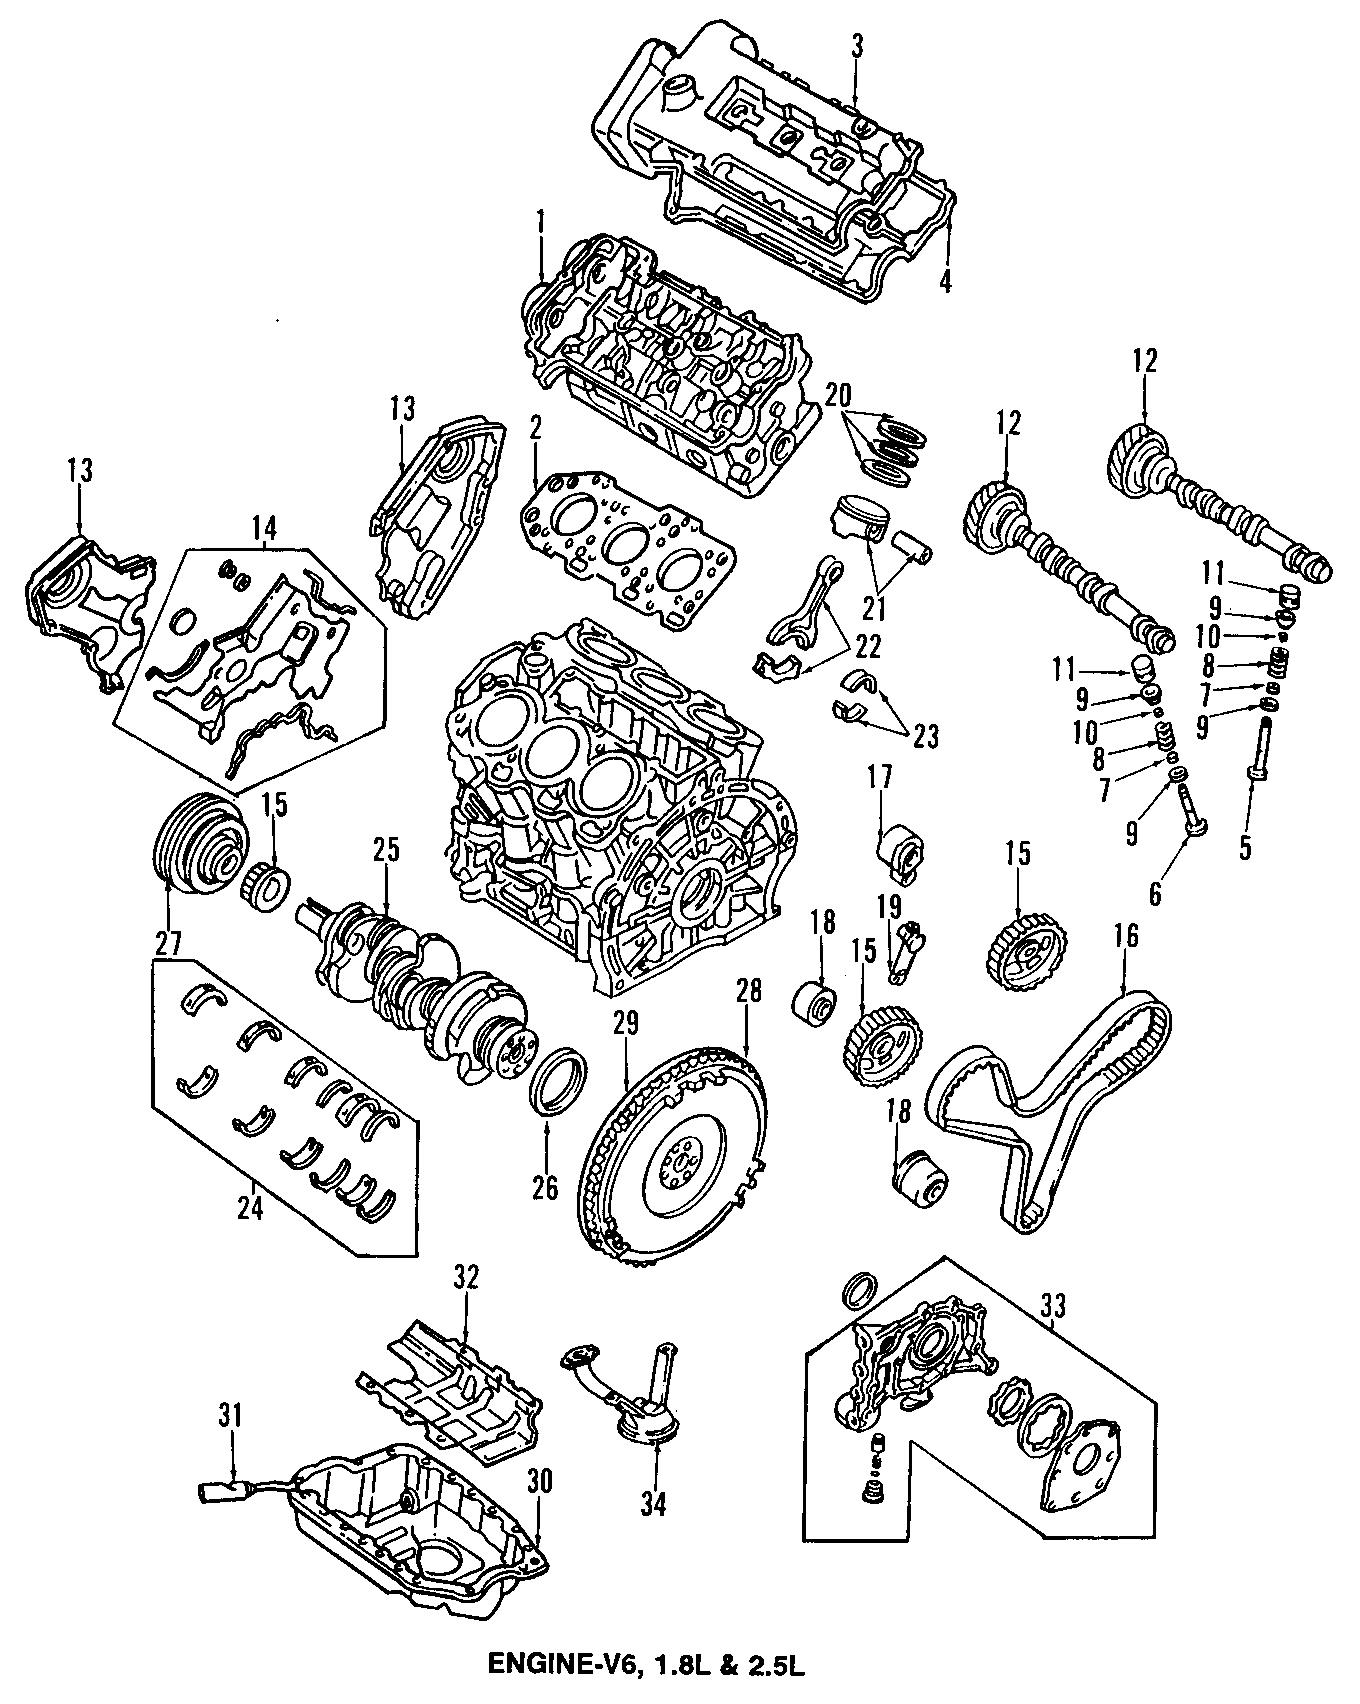 2001 Mazda 626 Engine Timing Belt - KL0112205 9U   Jim ...